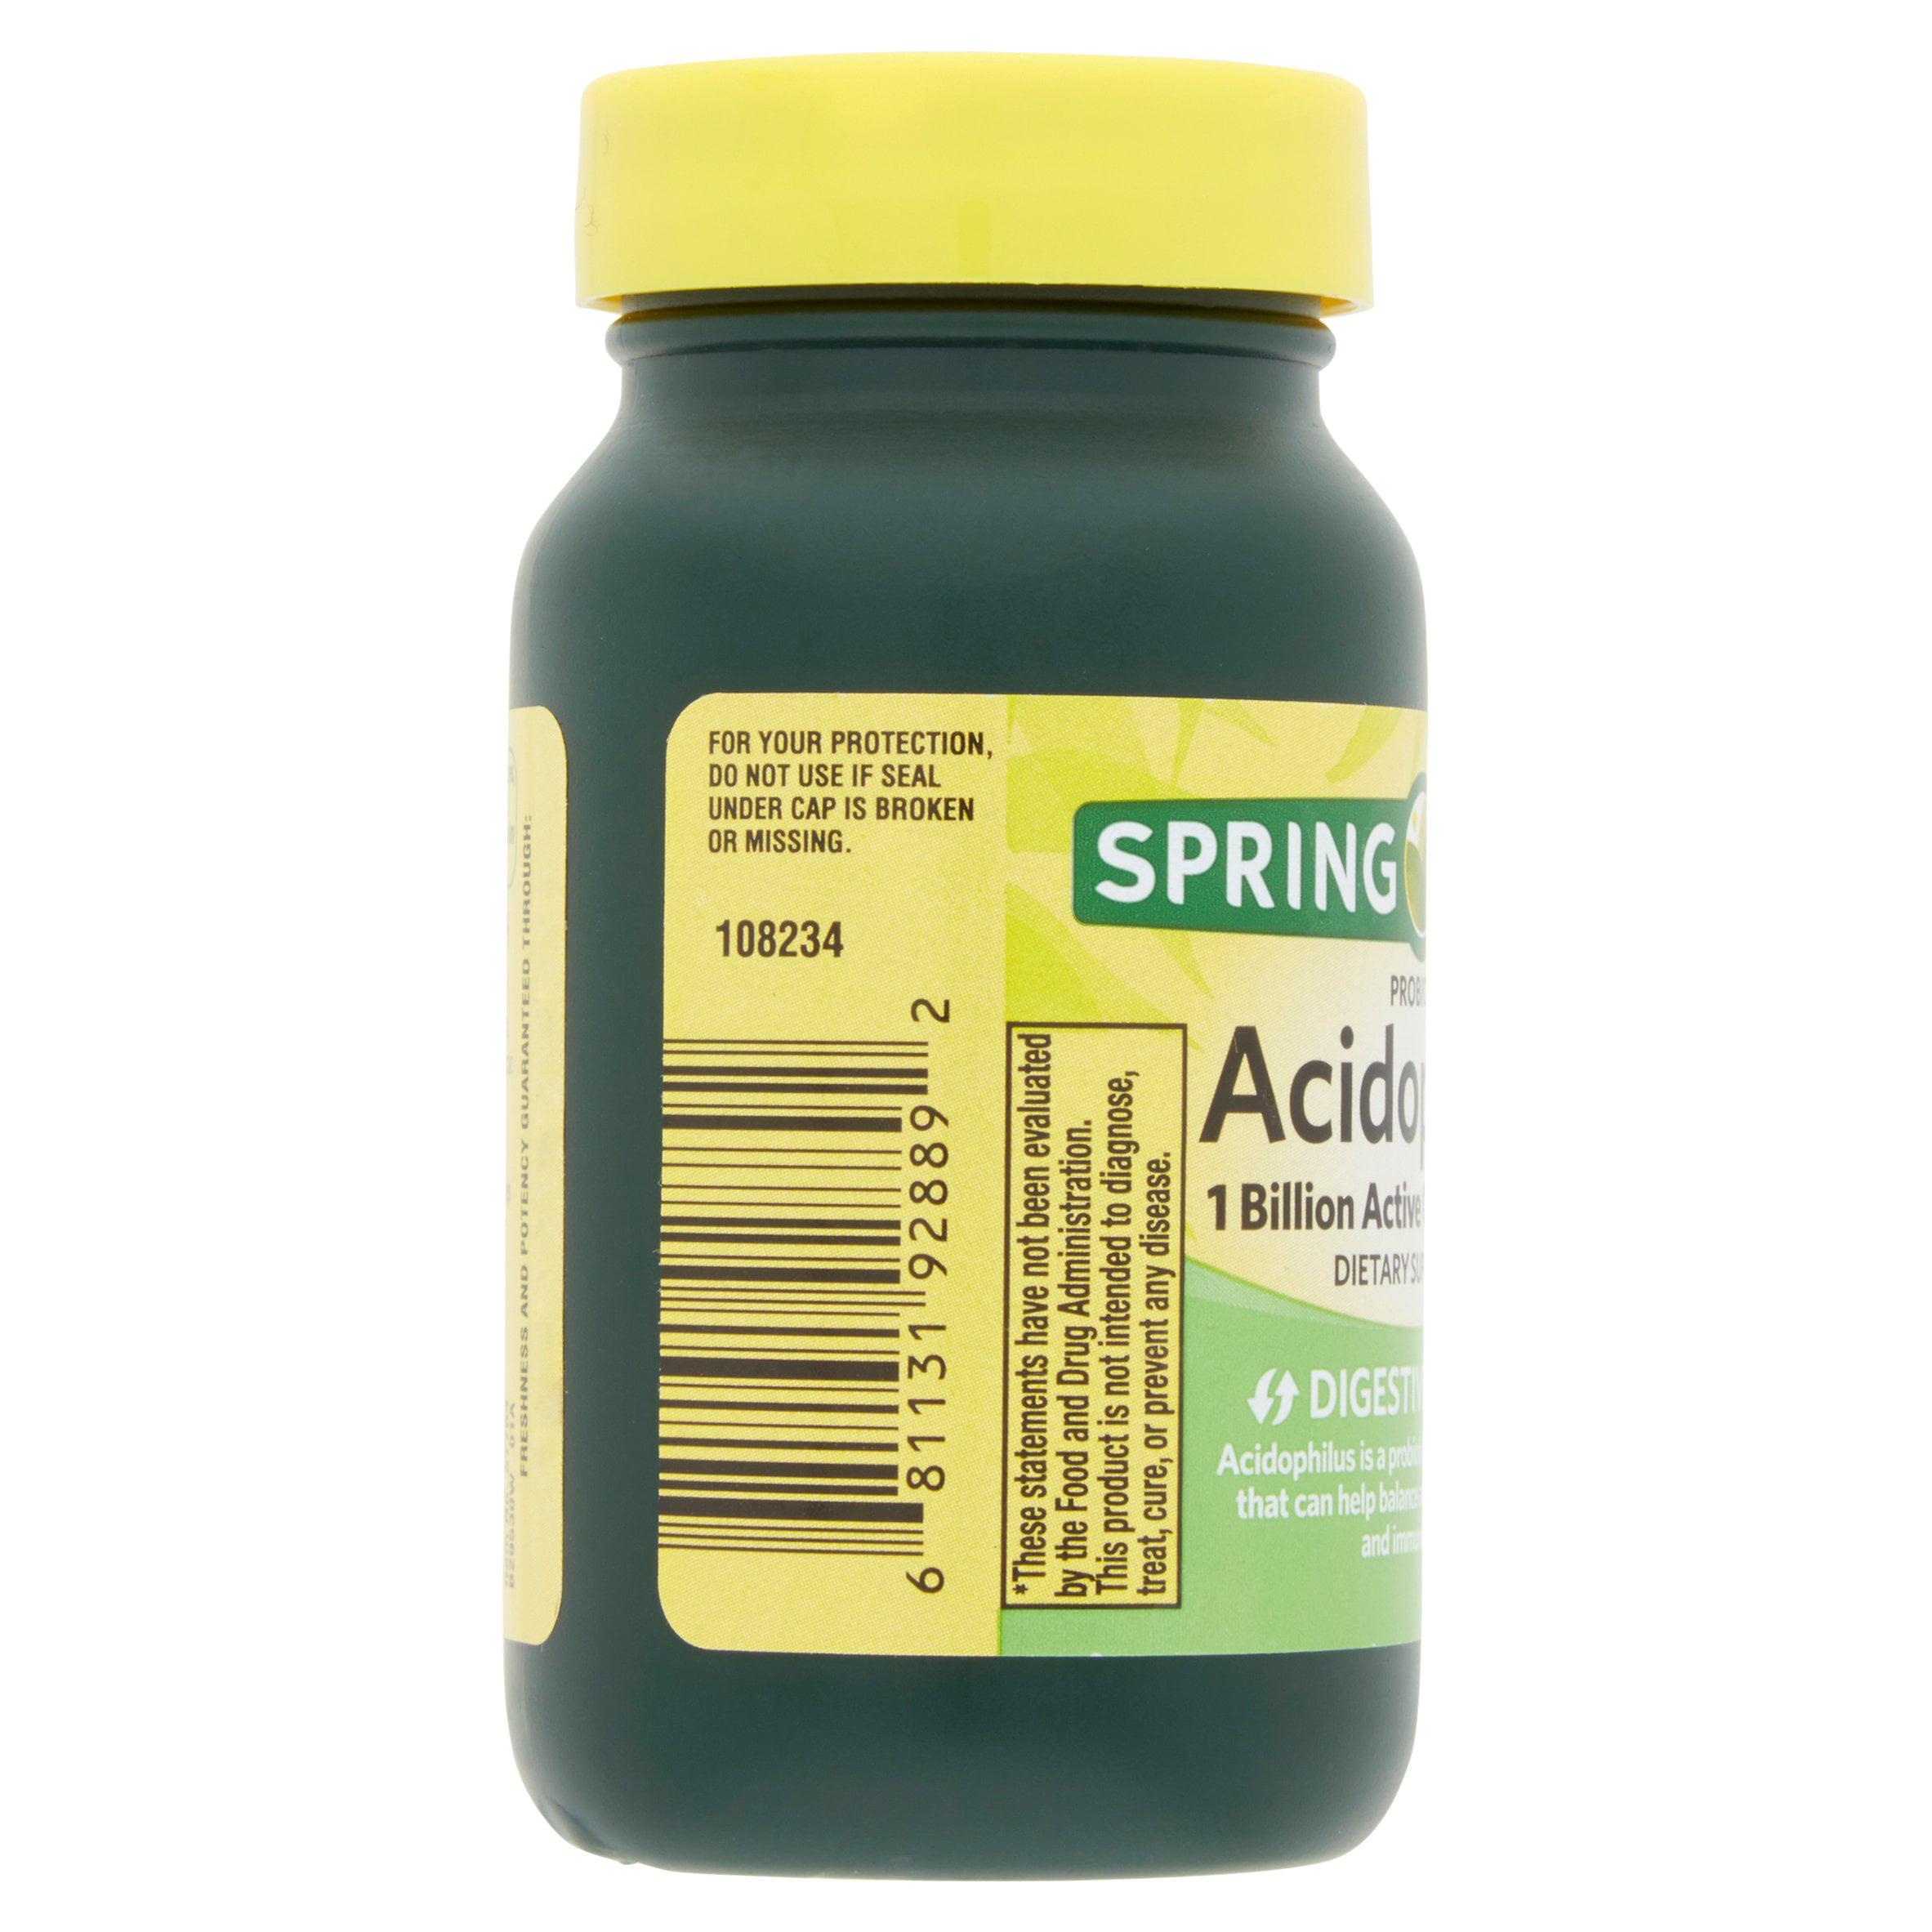 Spring Valley Acidophilus Probiotic Caplets, 5 mg, 30 Ct